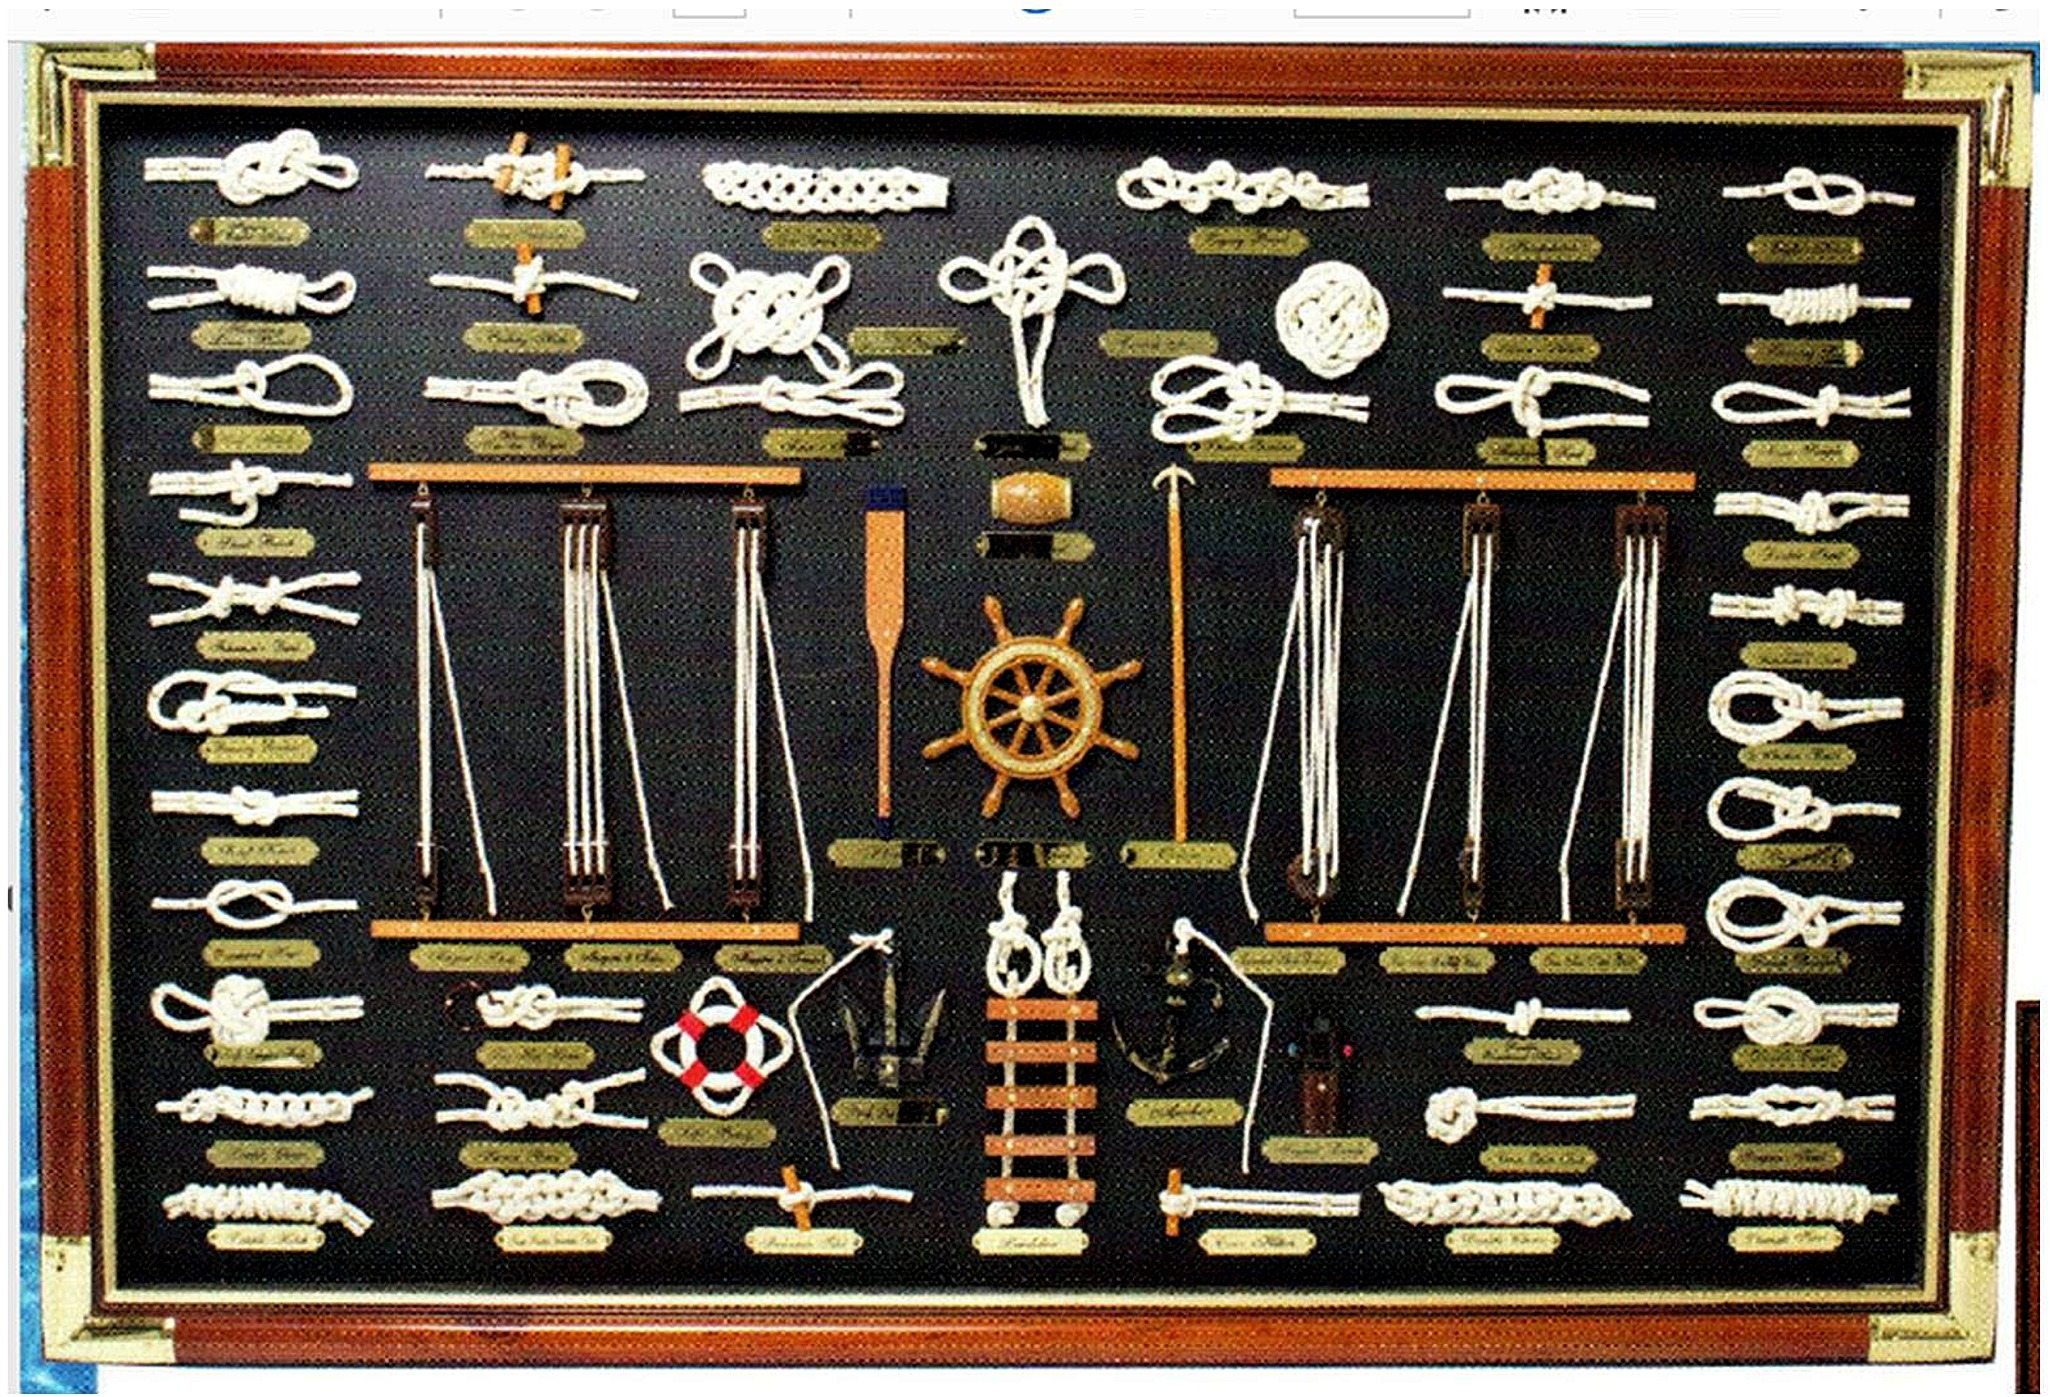 Nautical Home Decor Robin S Dockside Shop Knot Board Displays